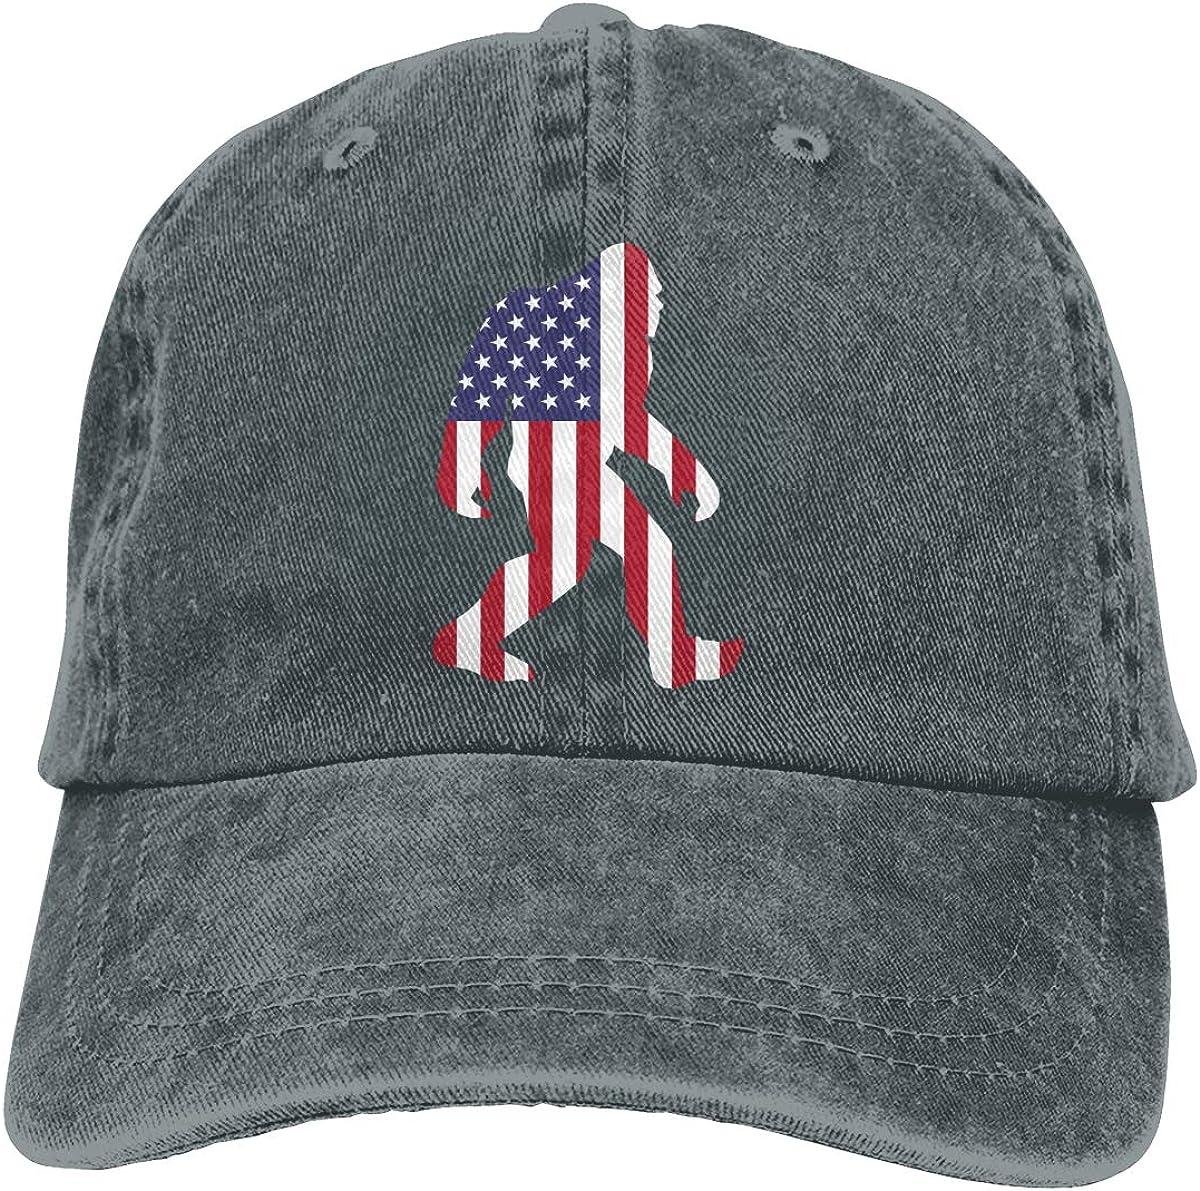 Q64 Bigfoot American Flag Unisex Adult Cowboy Hat Outdoor Sports Hat Adjustable Baseball Cap